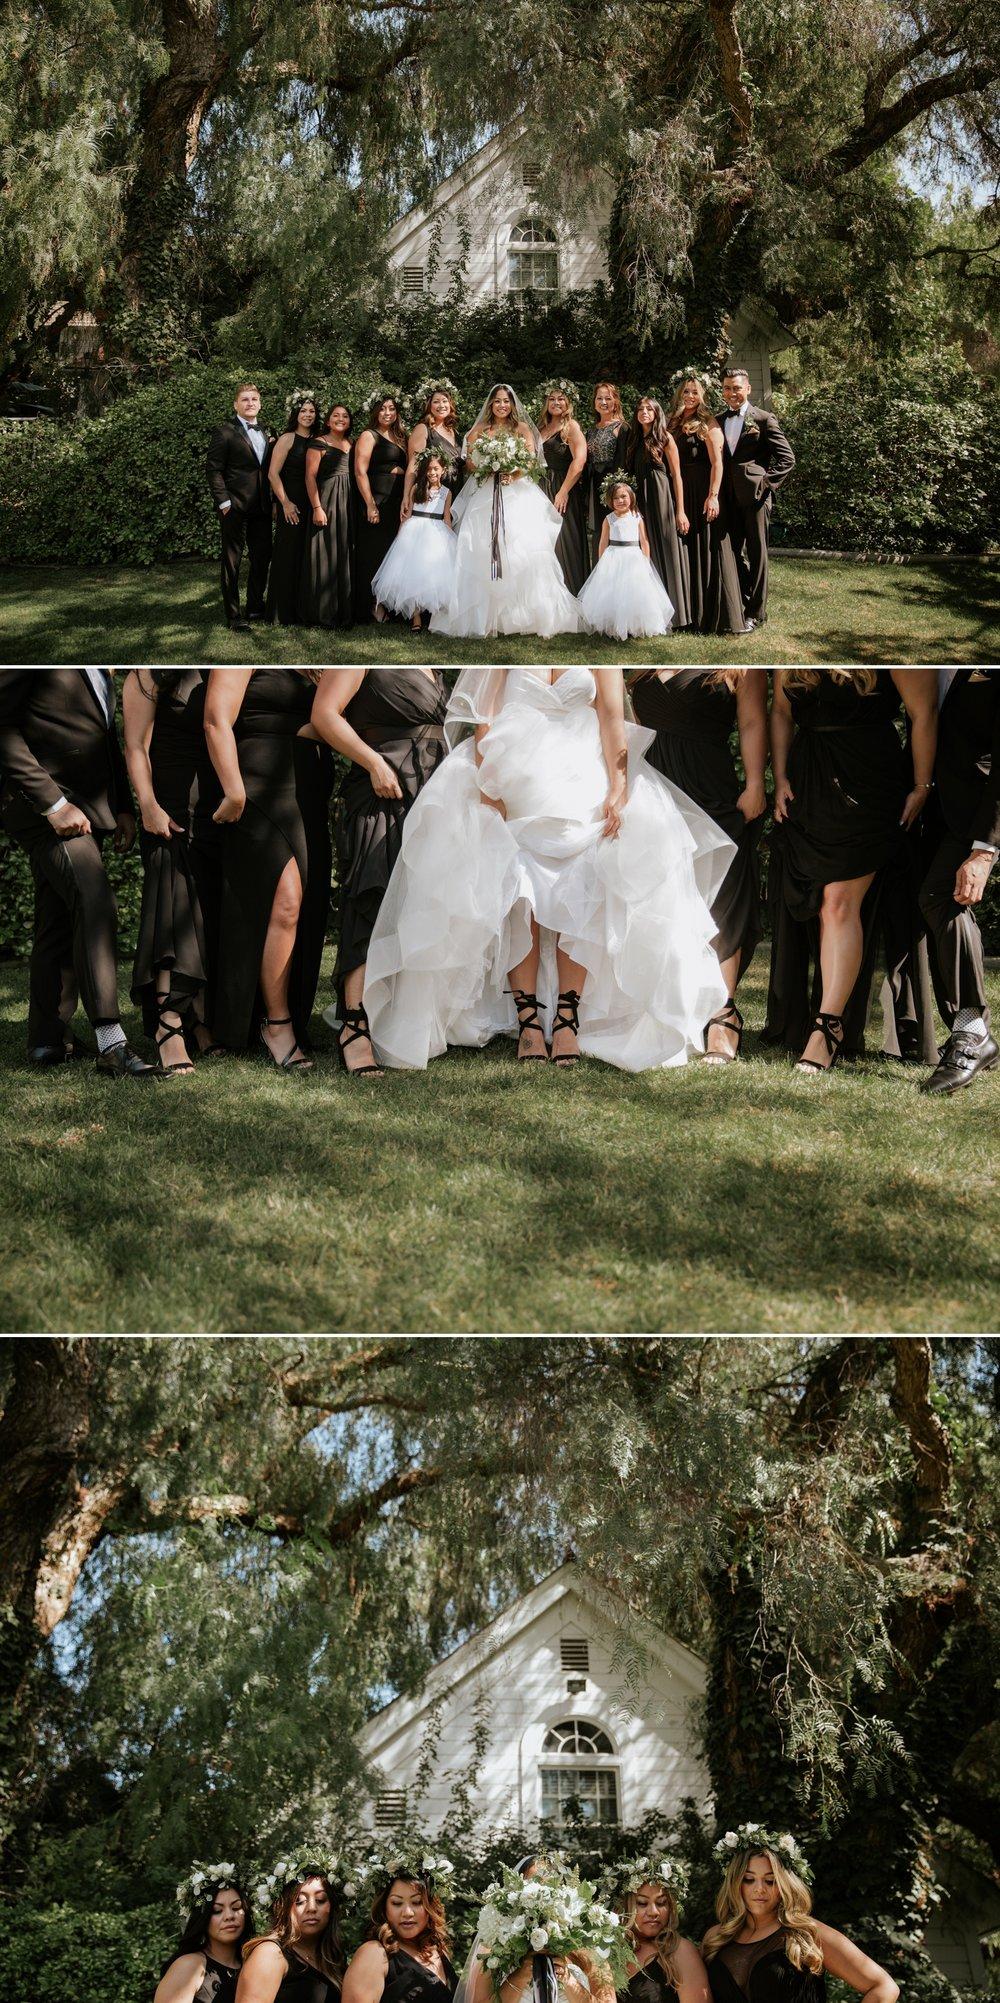 All black bridesmaid's dresses at garden wedding venue in San Diego